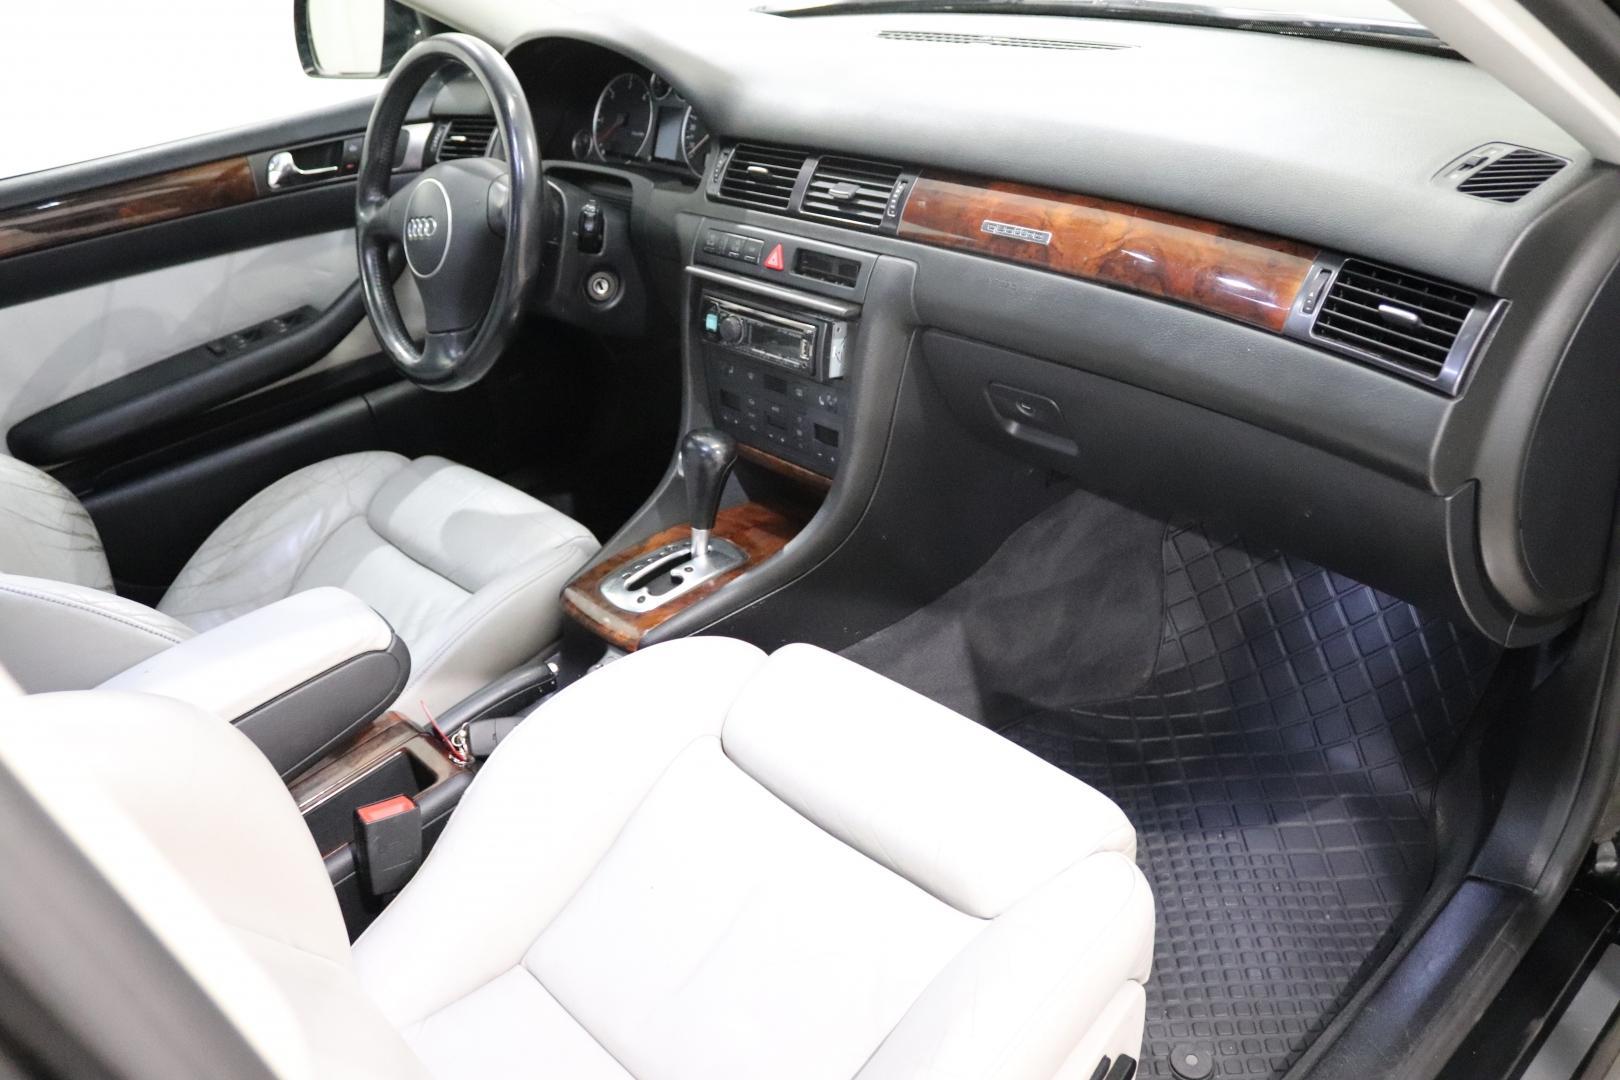 Audi A6 Allroad, 2.5 V6 TDI 132 Quattro A